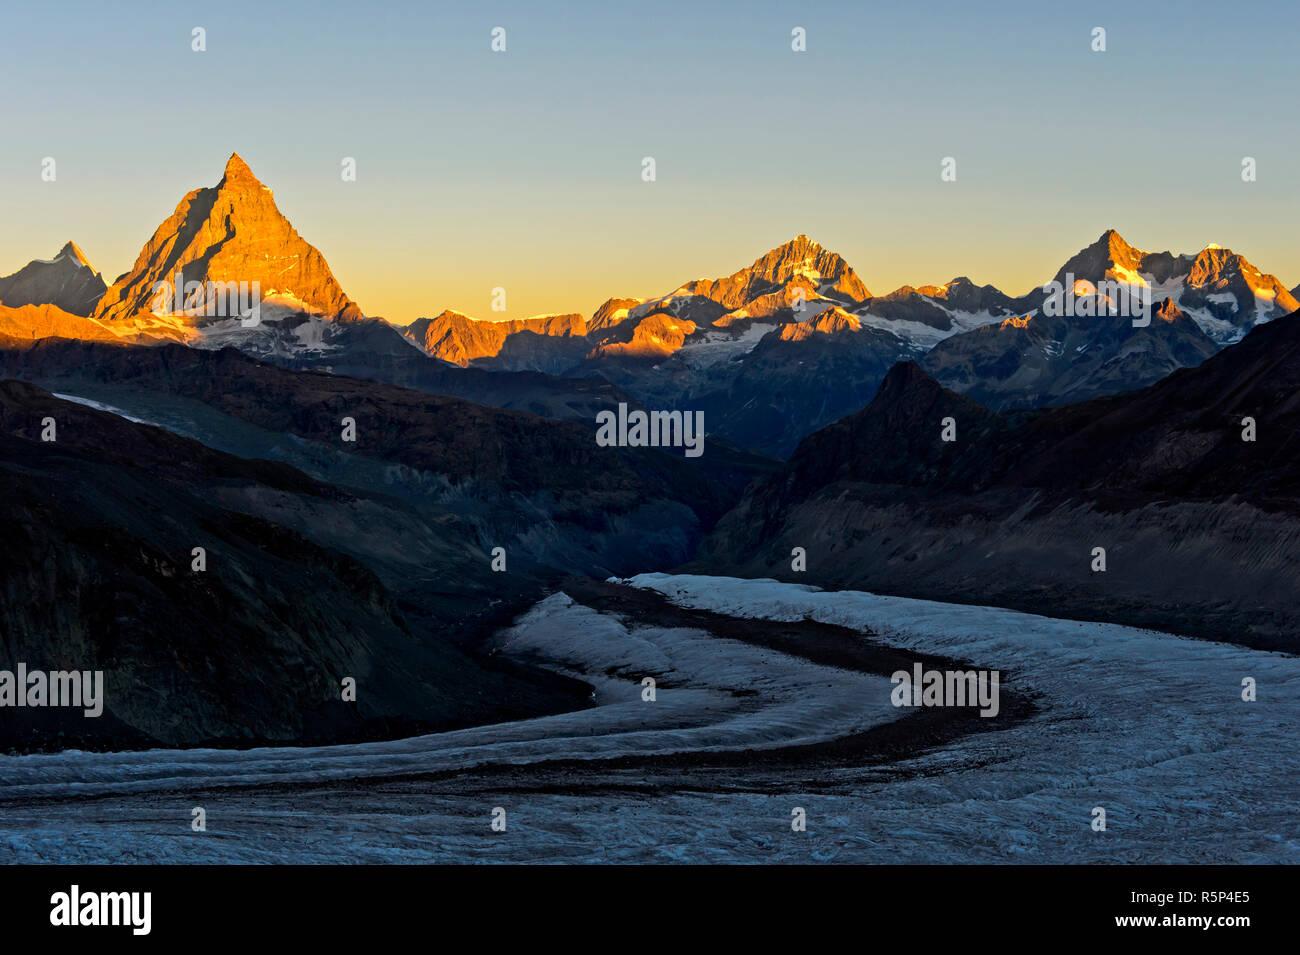 Morning sun at the Matterhorn, Dent d'Herens left, Dent Blanche, Ober Gabelhorn and Wellenkuppe right, Gorner glacier in front, Zermatt, Valais, Switz Stock Photo